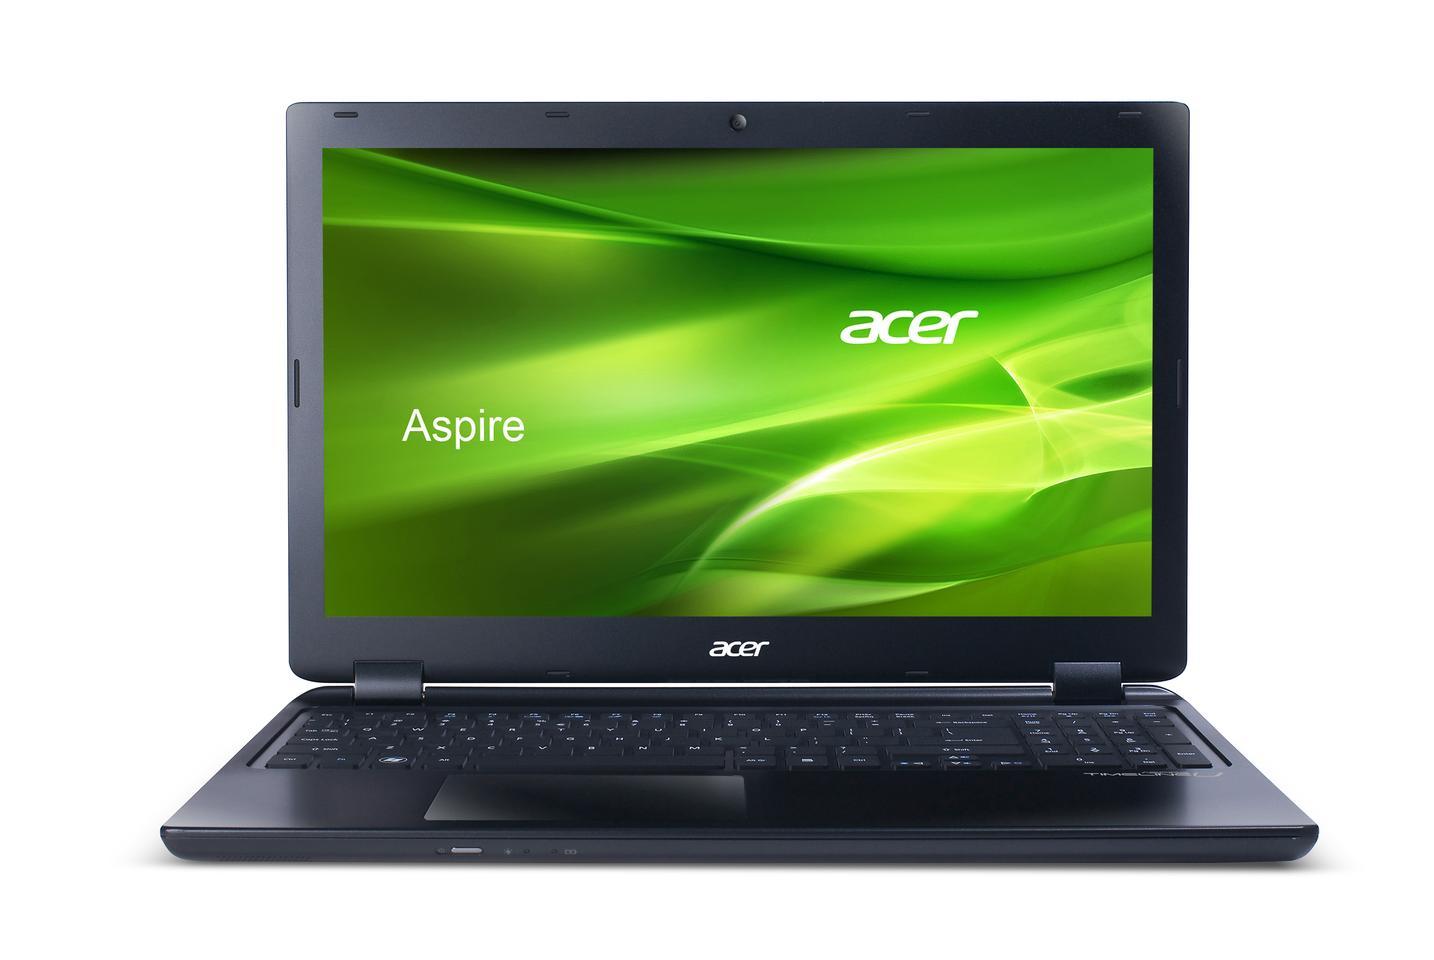 Acer's new Aspire M3 touchscreen Ultrabook